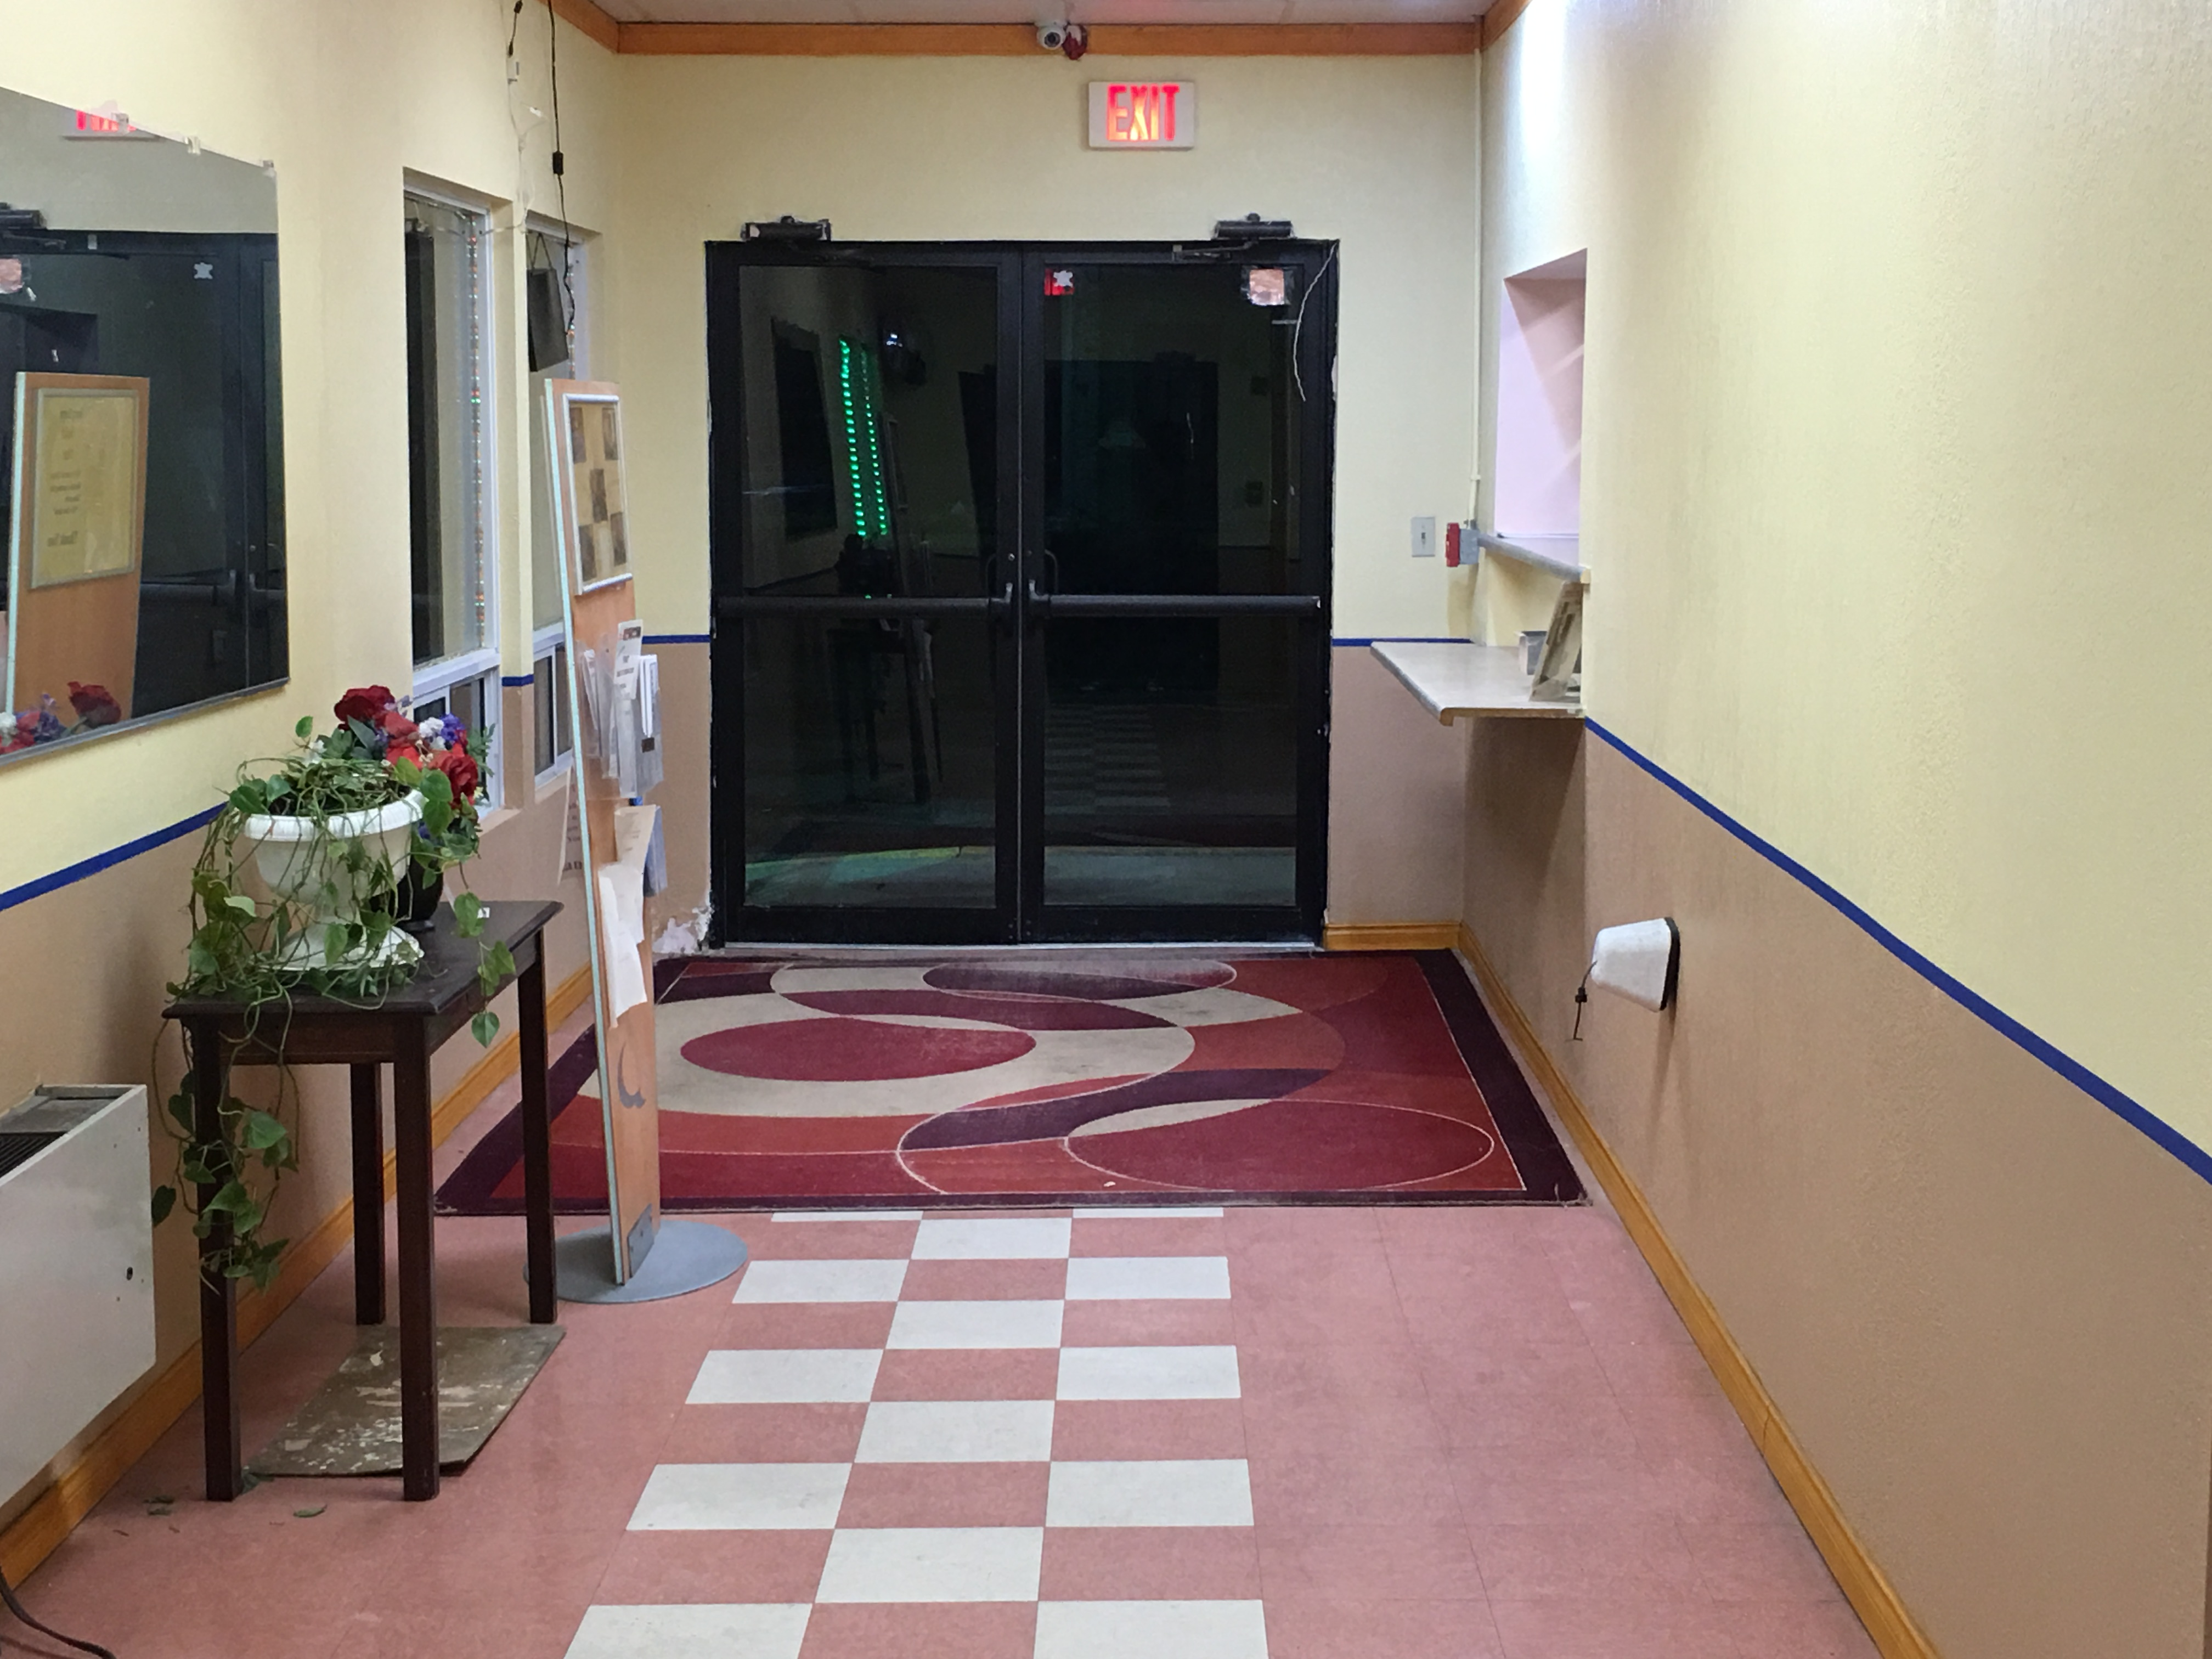 Red Carpet Inn & Suites image 2